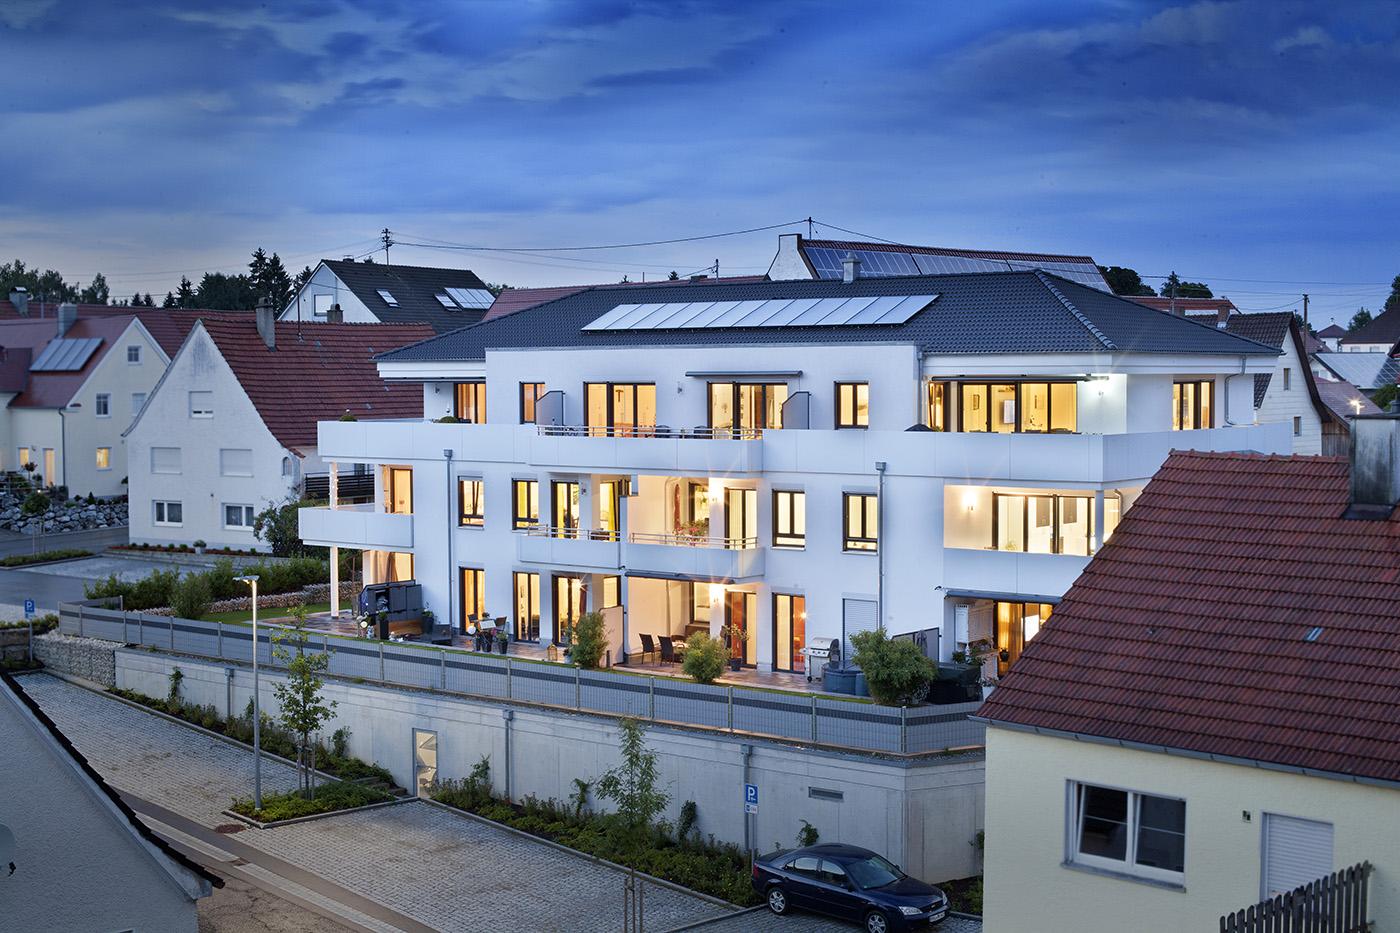 Fotografie Mehrfamilienhaus in Babenhausen